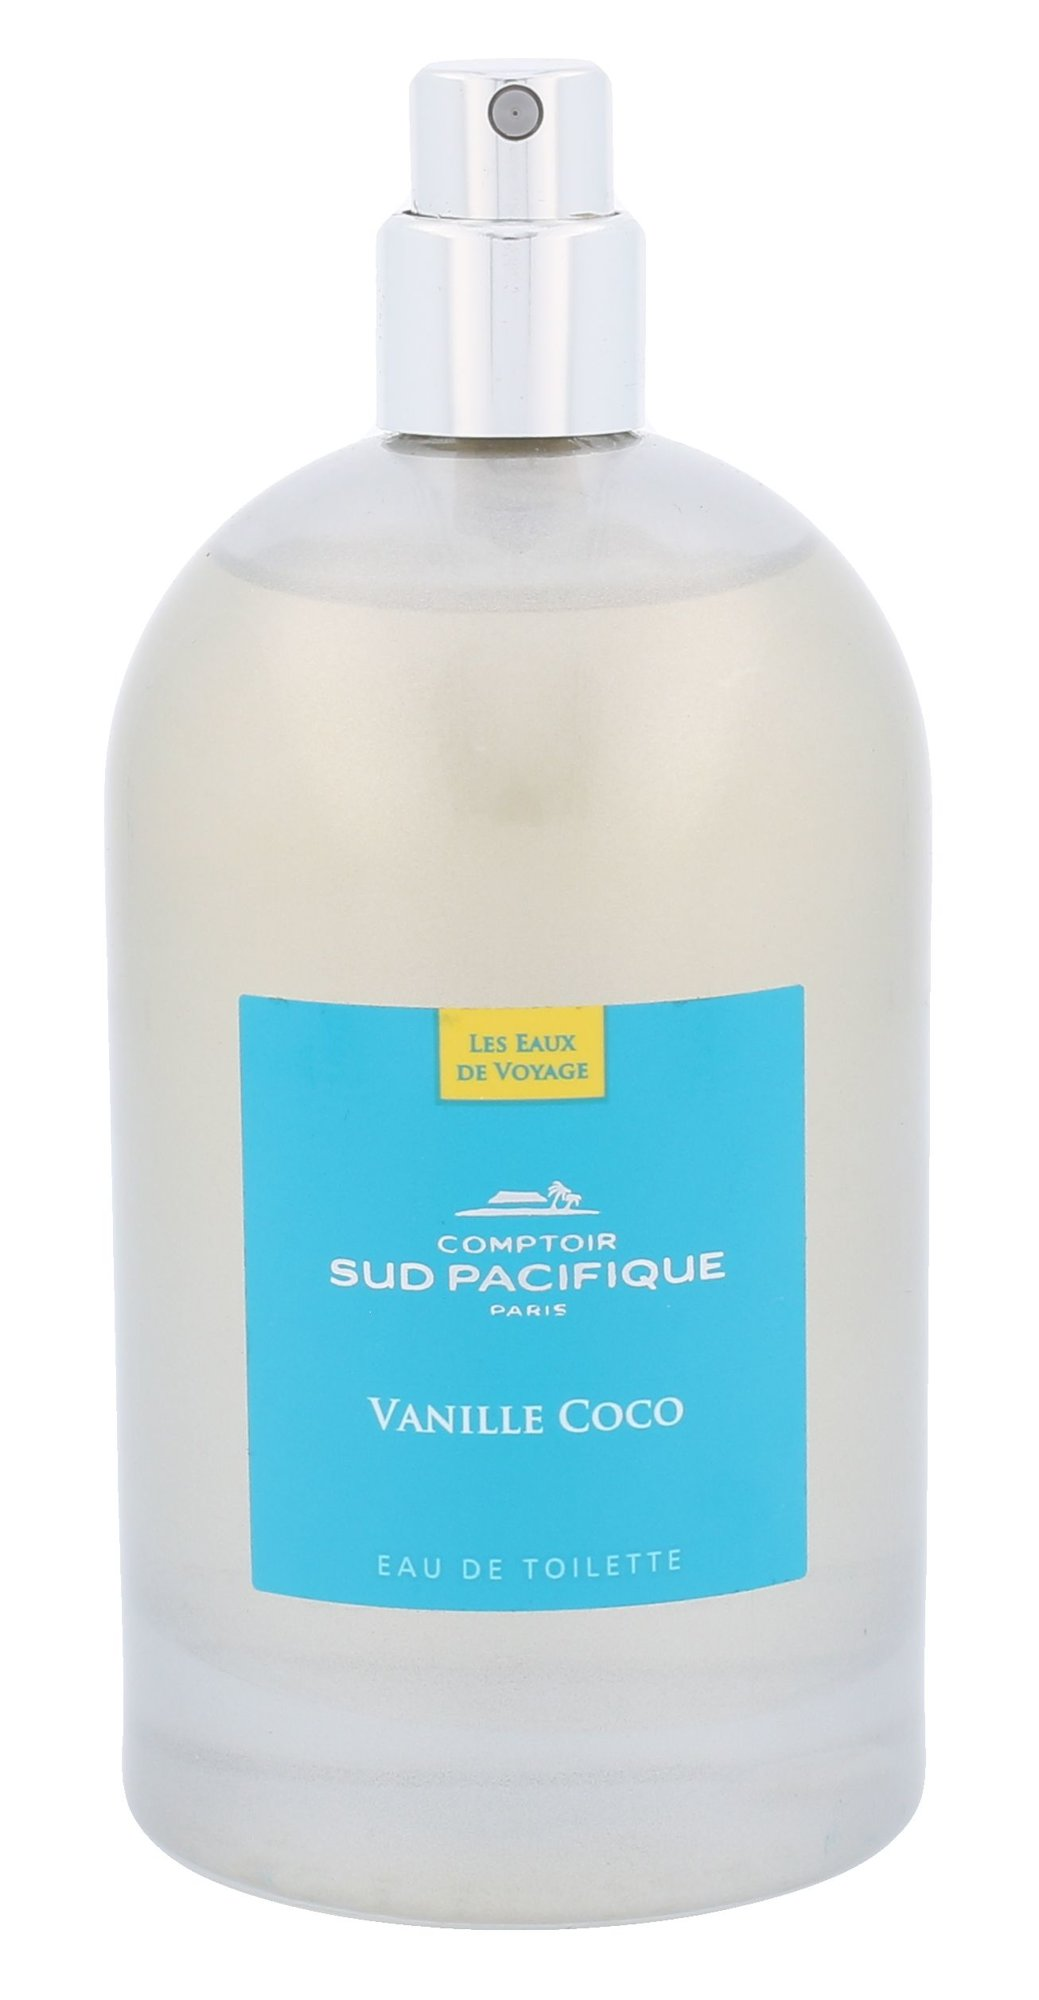 Comptoir Sud Pacifique Vanille Coco EDT 100ml